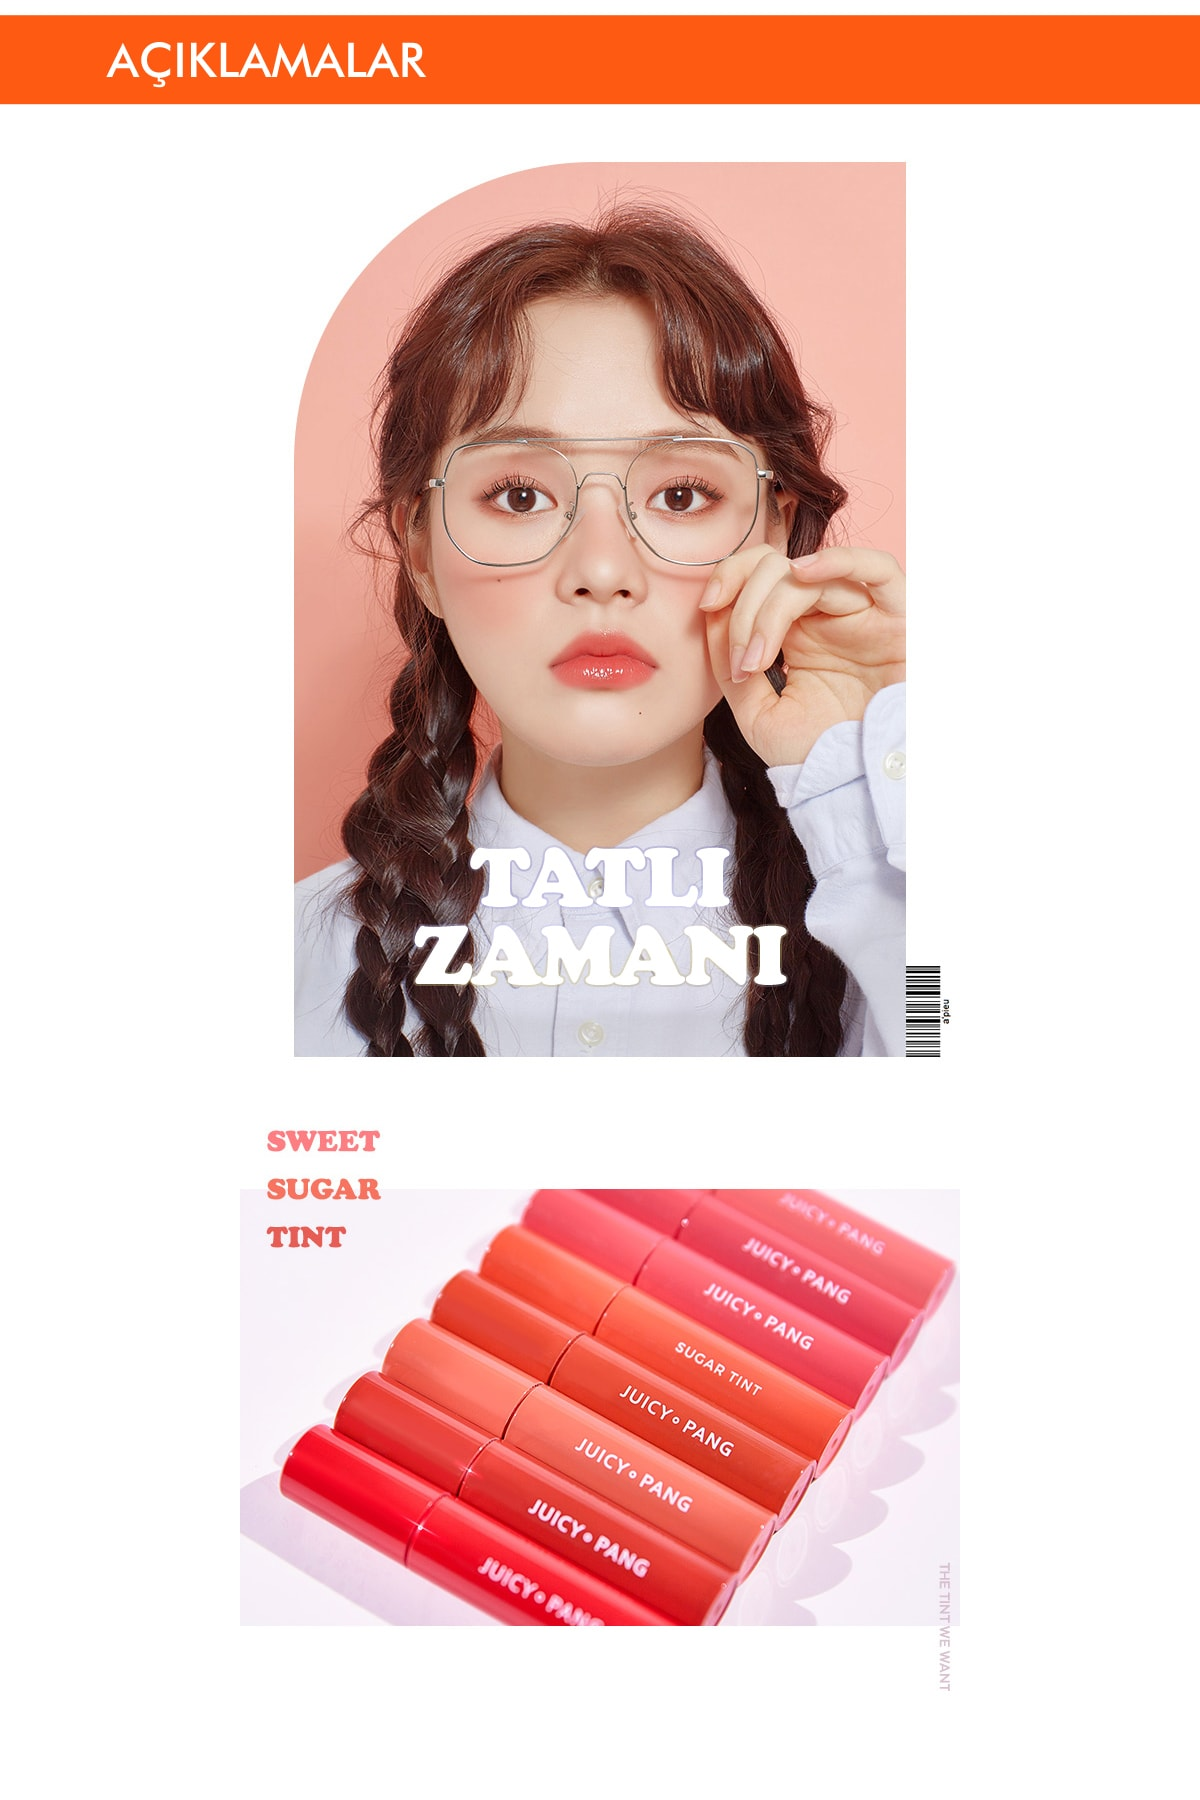 Missha Uzun Süre Kalıcı Parlak Su Bazlı Jel Tint  APIEU Juicy-Pang Sugar Tint (PK02) 1